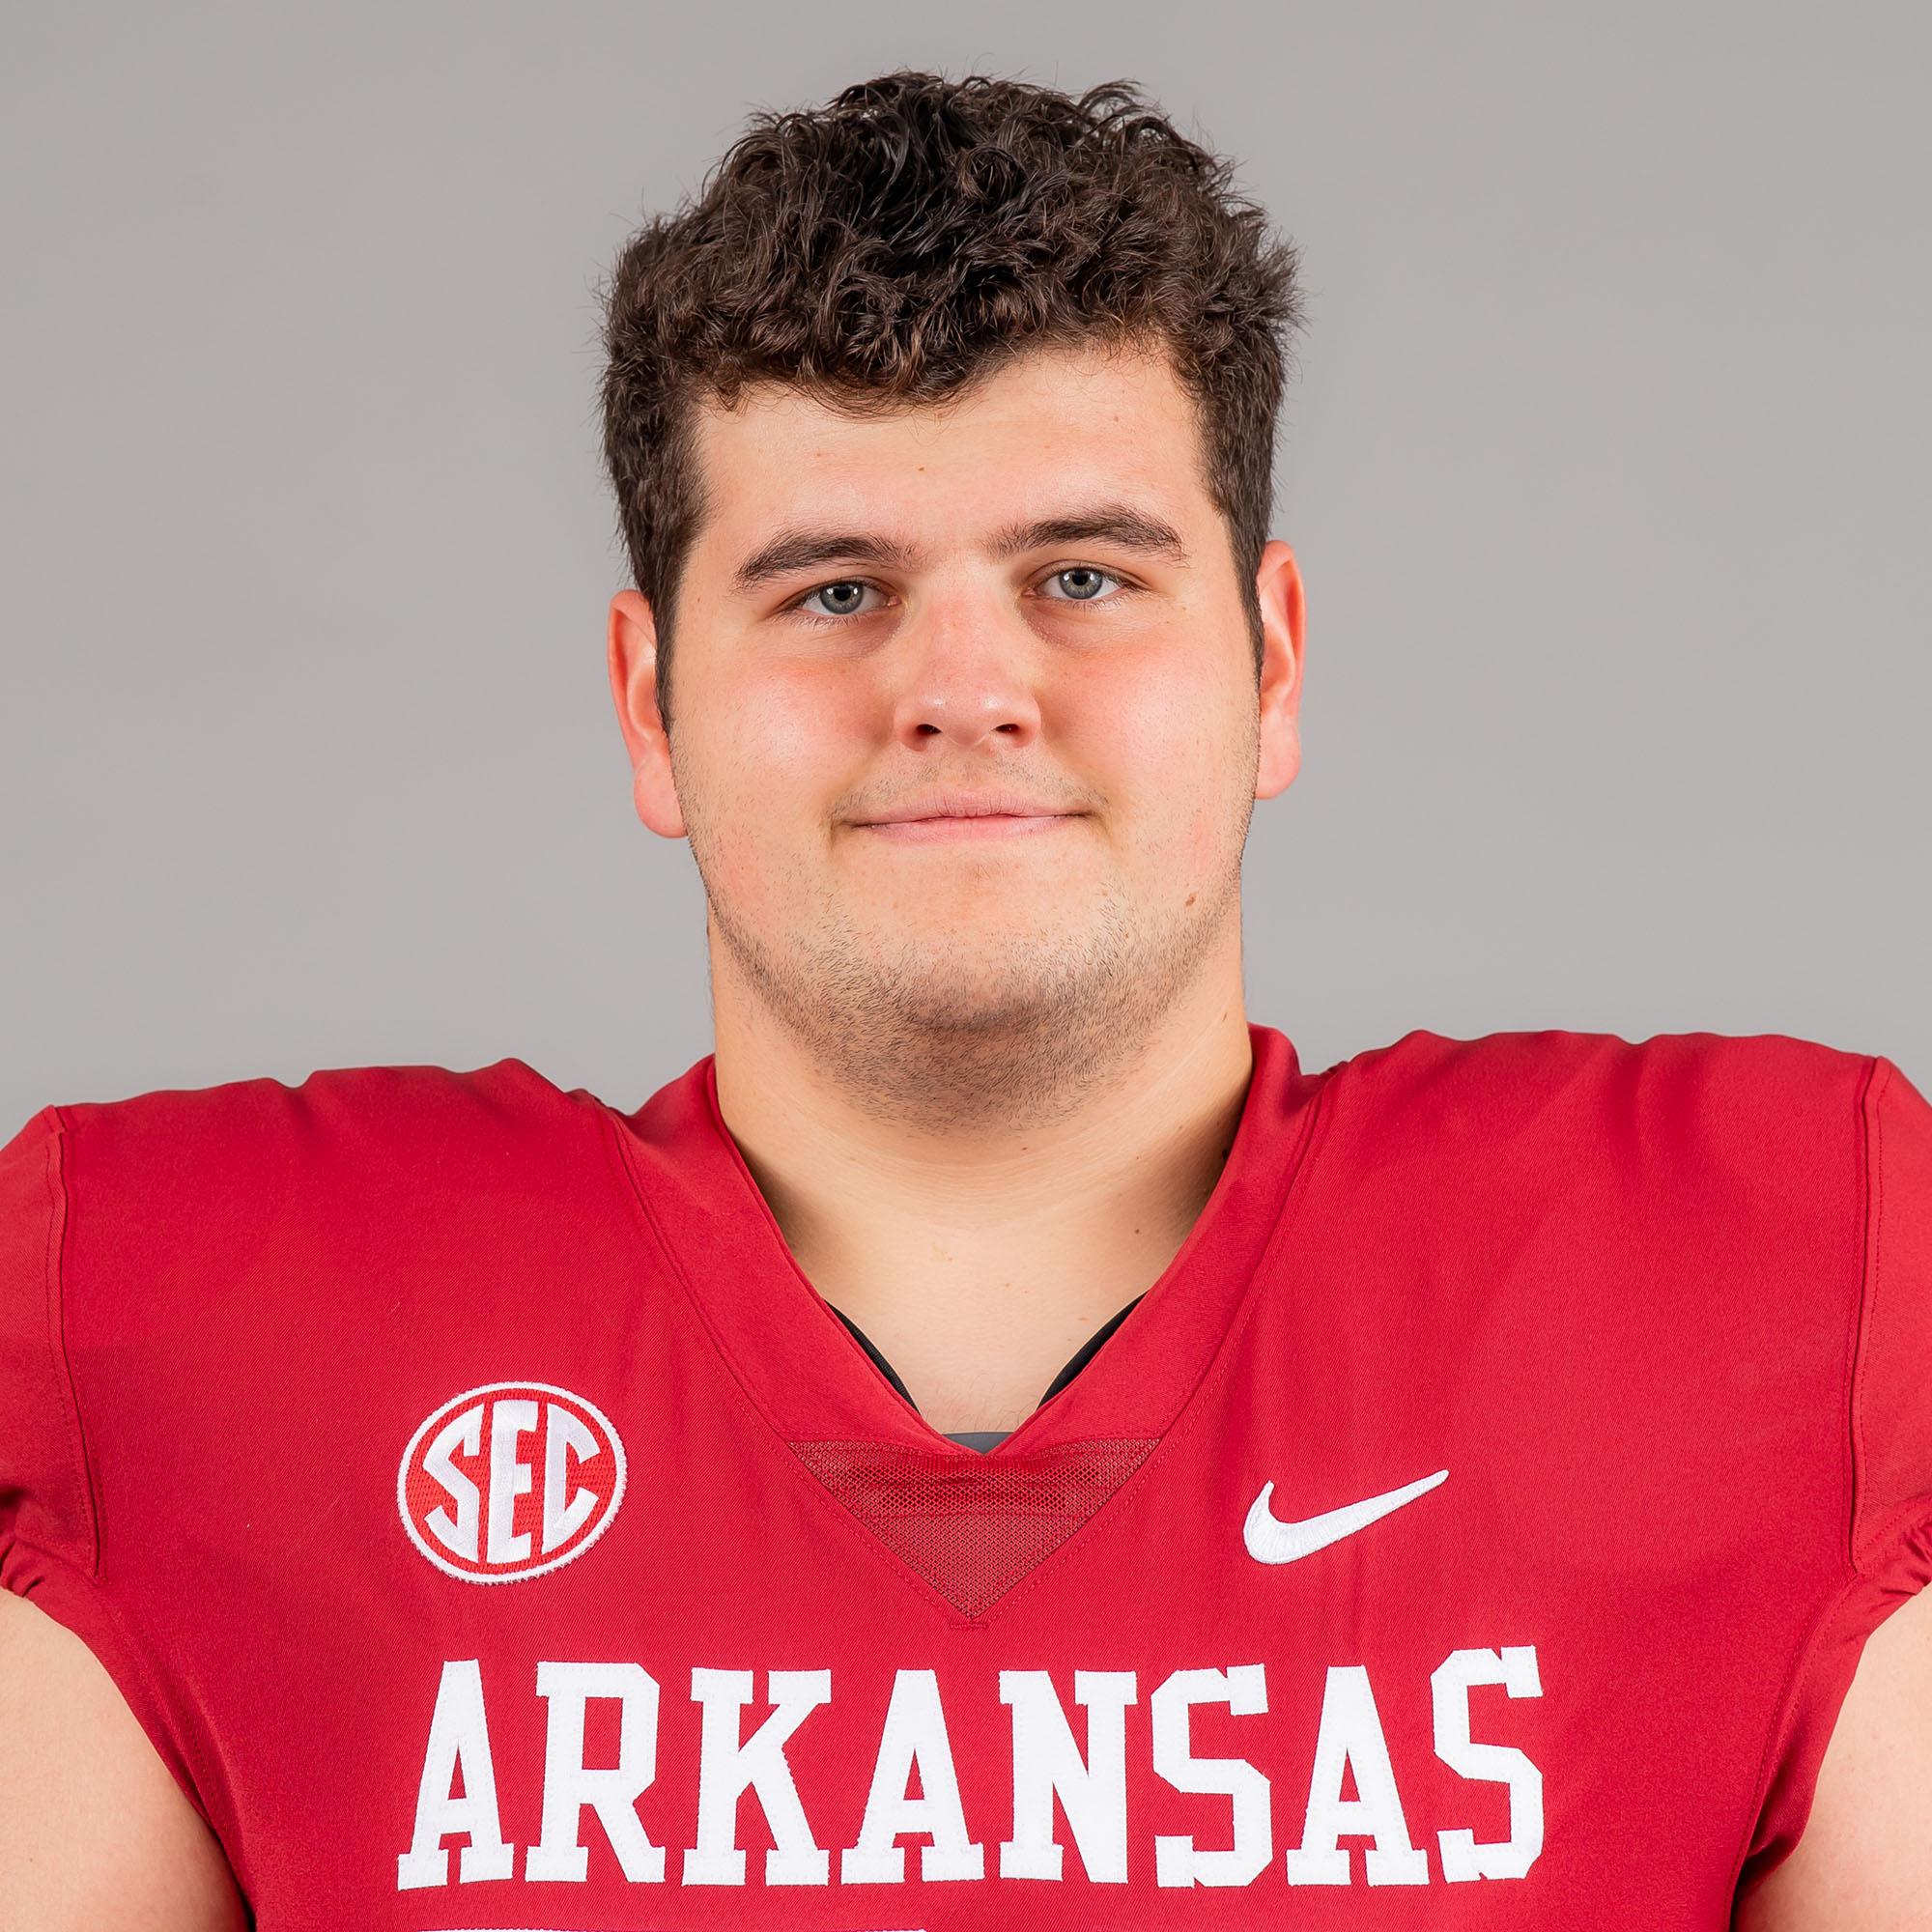 Dylan Rathcke - Football - Arkansas Razorbacks